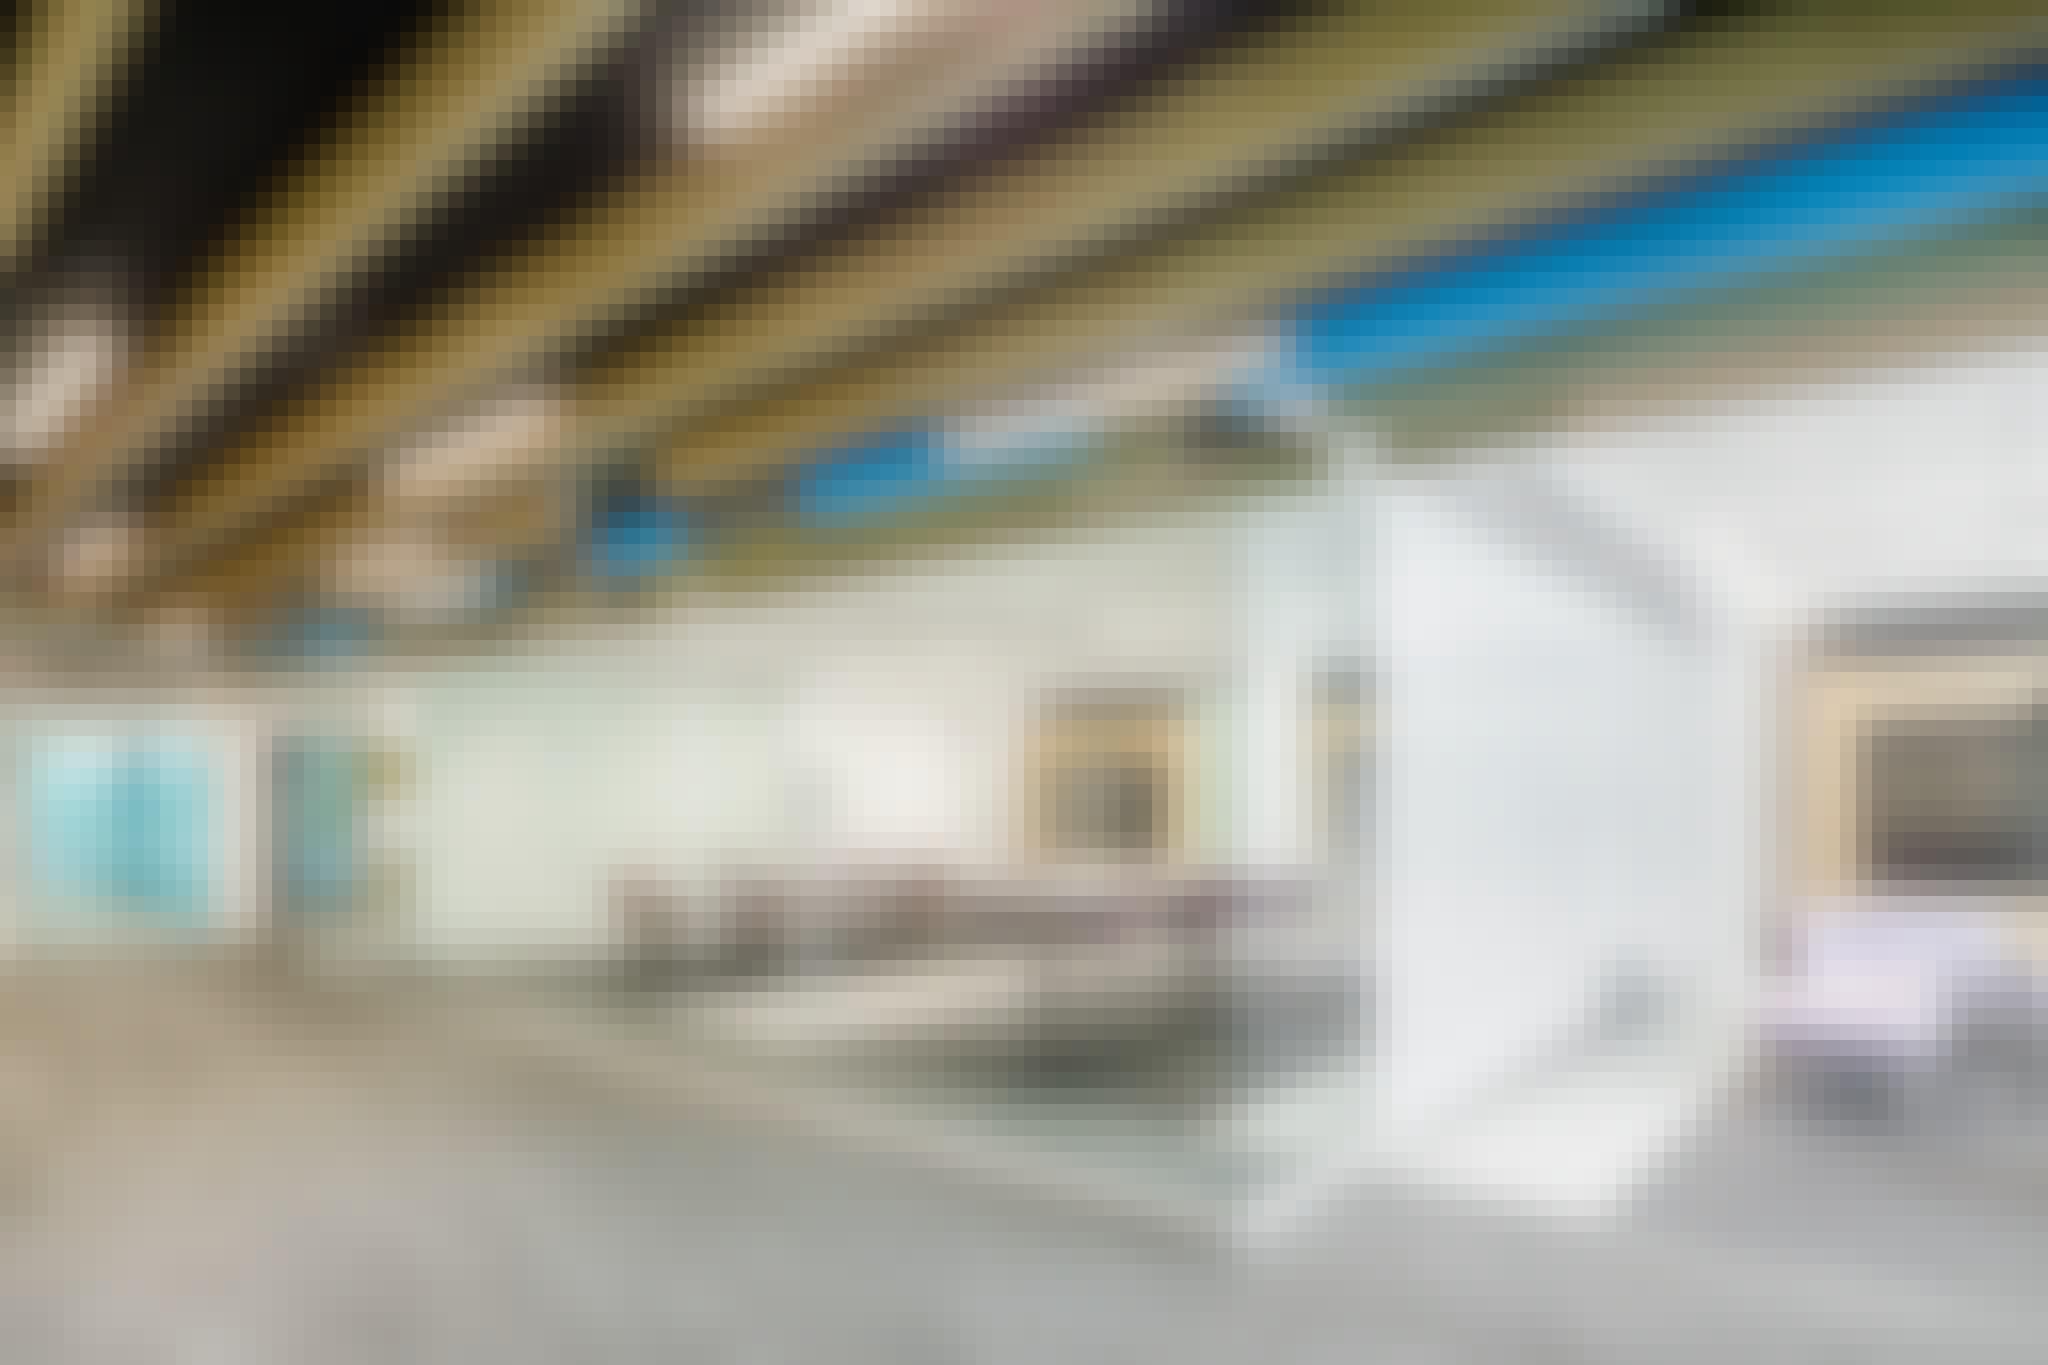 reduce aerosol spread with retractable interior glass walls